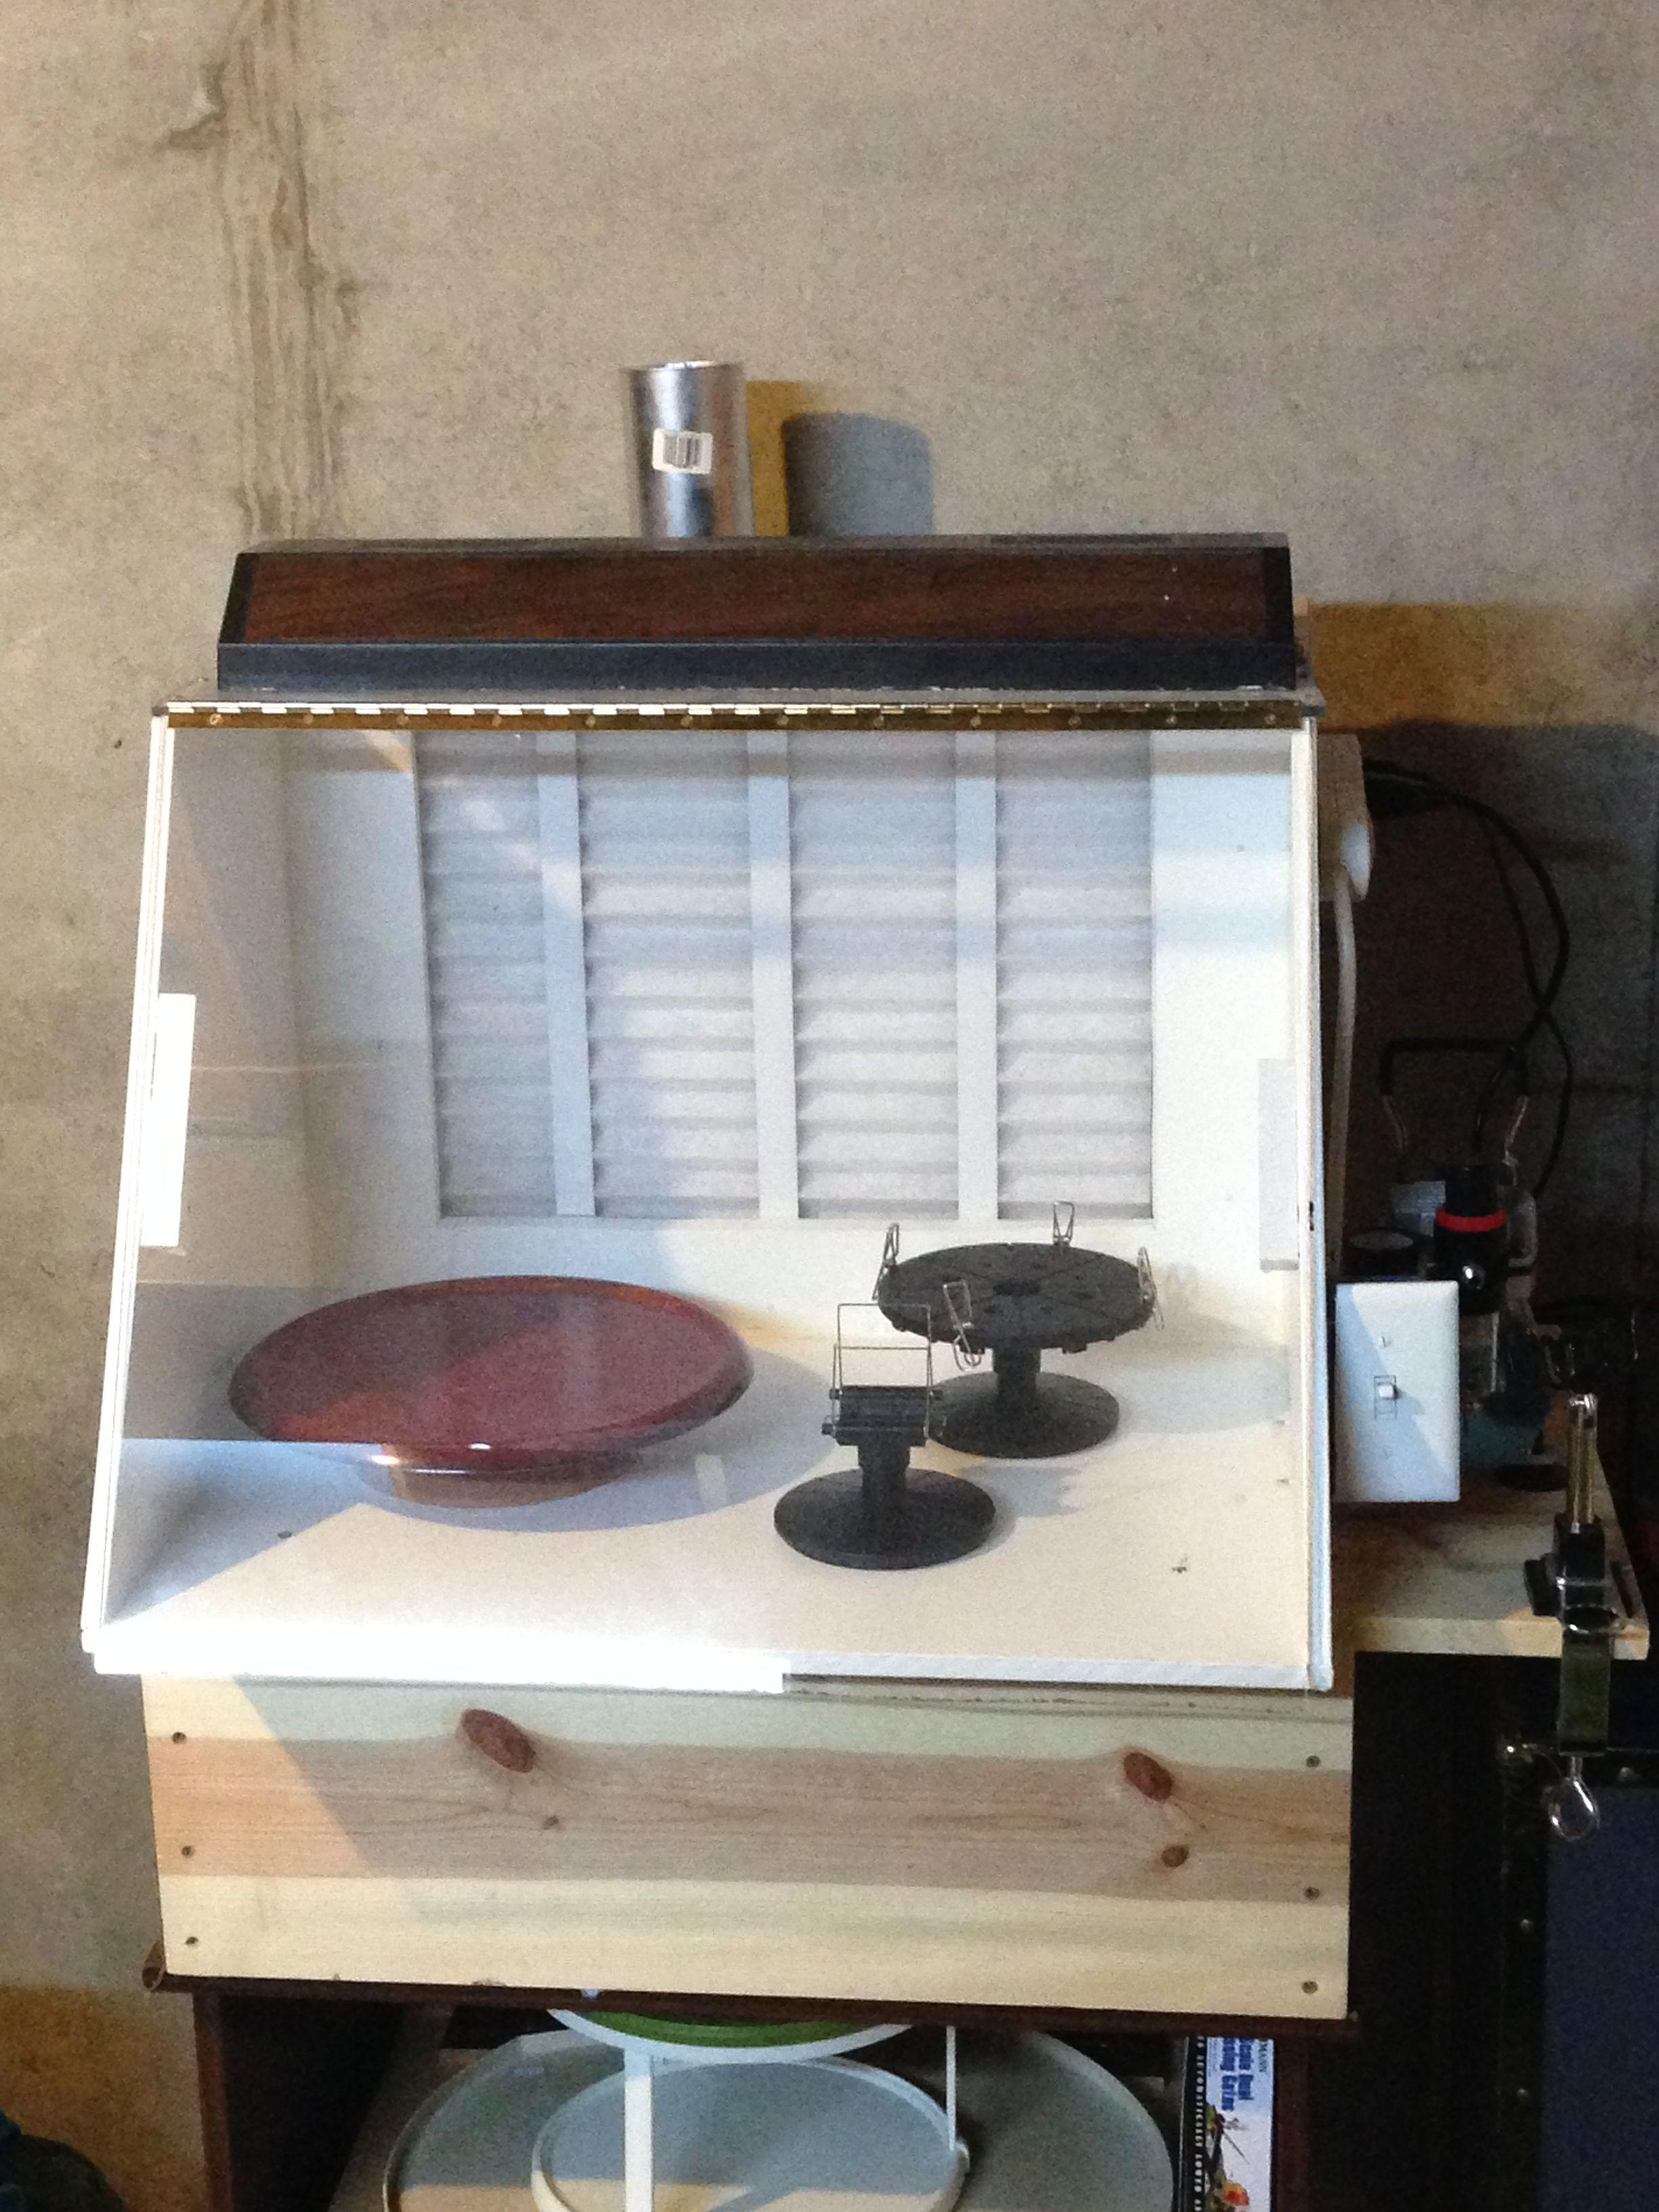 Custm paint booth spray booth diy airbrush spray booth